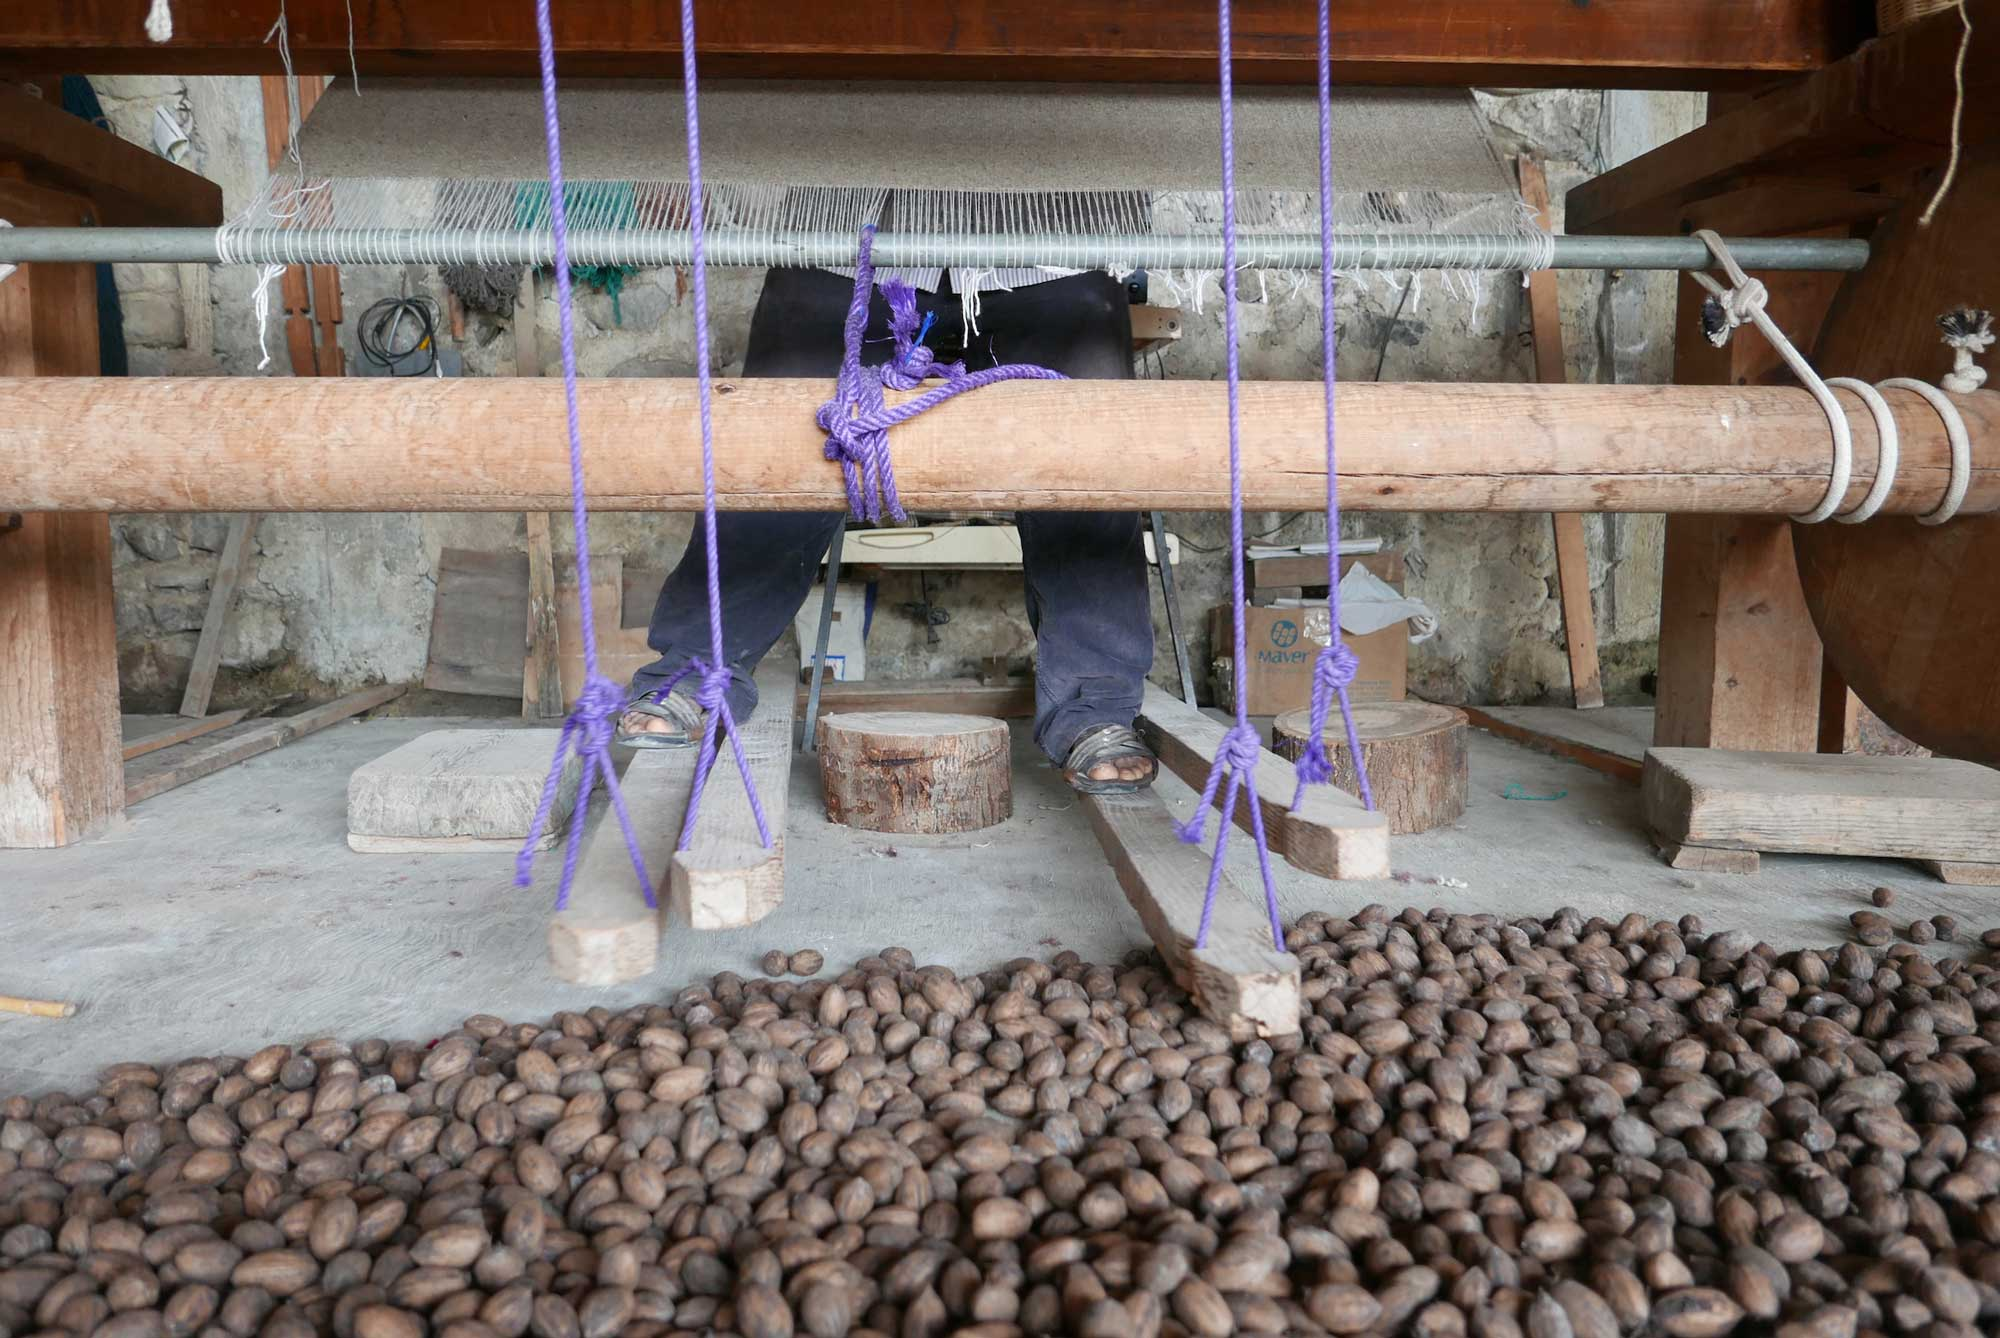 Artisan Weaving Mexican Zapotec Rug on a Foot Pedal Loom in Teotitlan de Valle Mexico